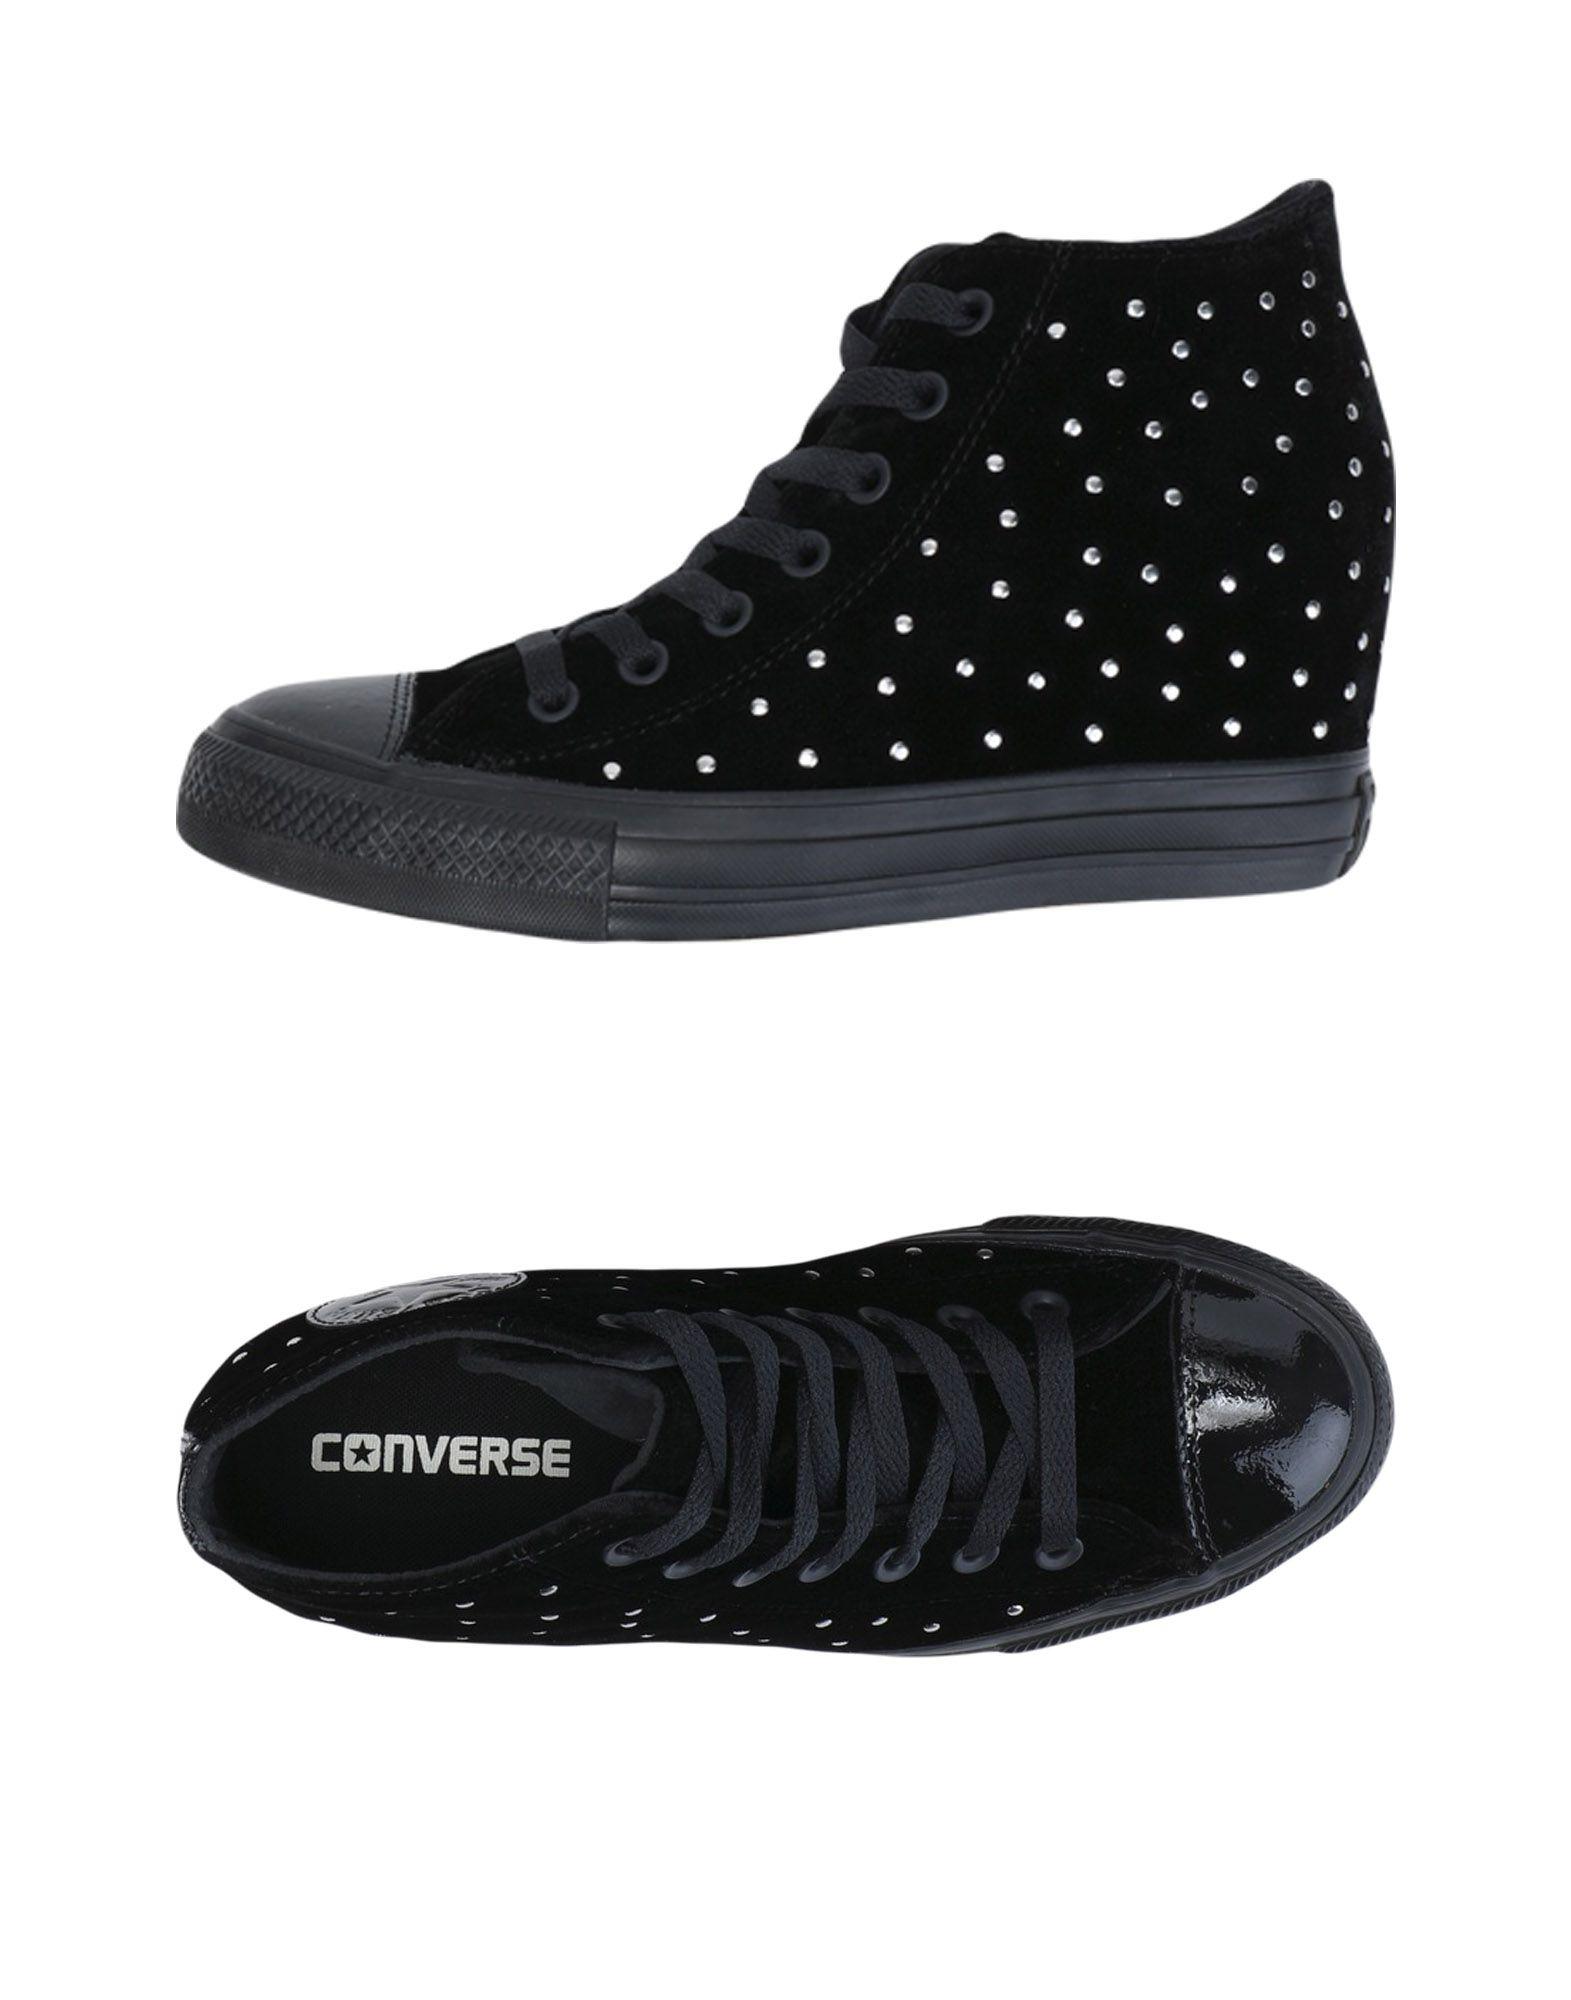 CONVERSE ALL STAR Высокие кеды и кроссовки converse limited edition высокие кеды и кроссовки